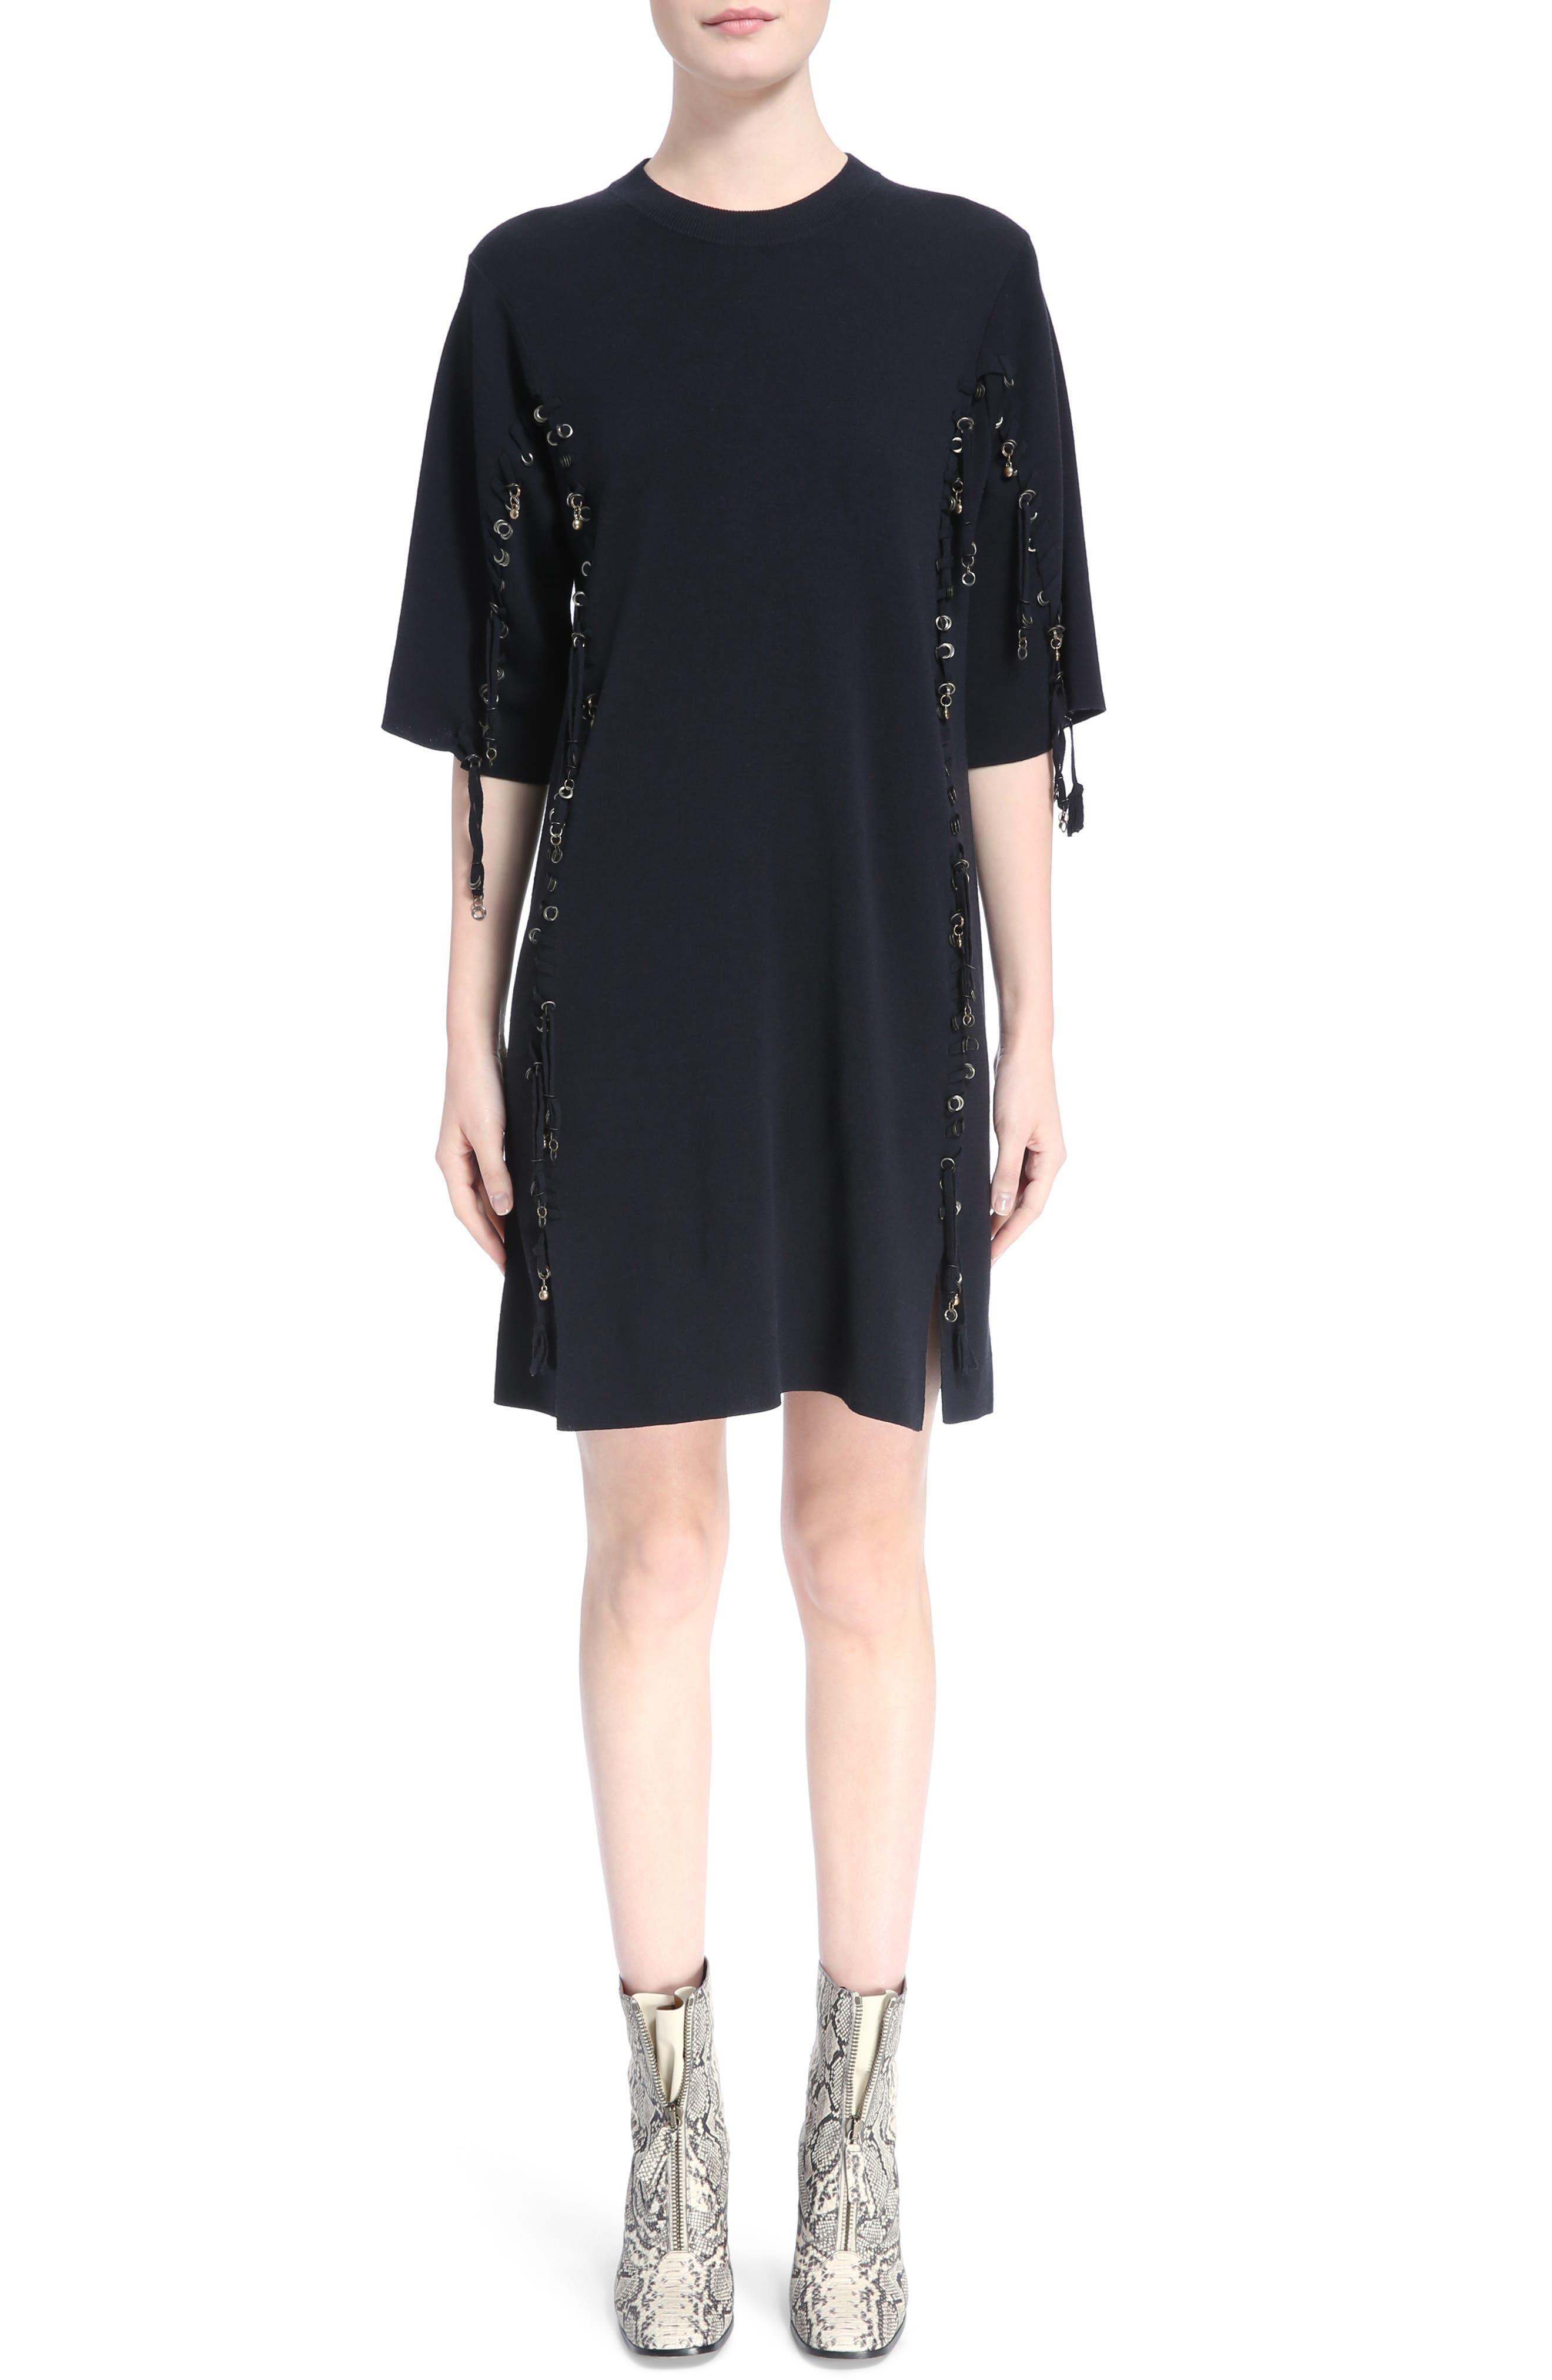 Chloé Laced Grommet Wool Dress